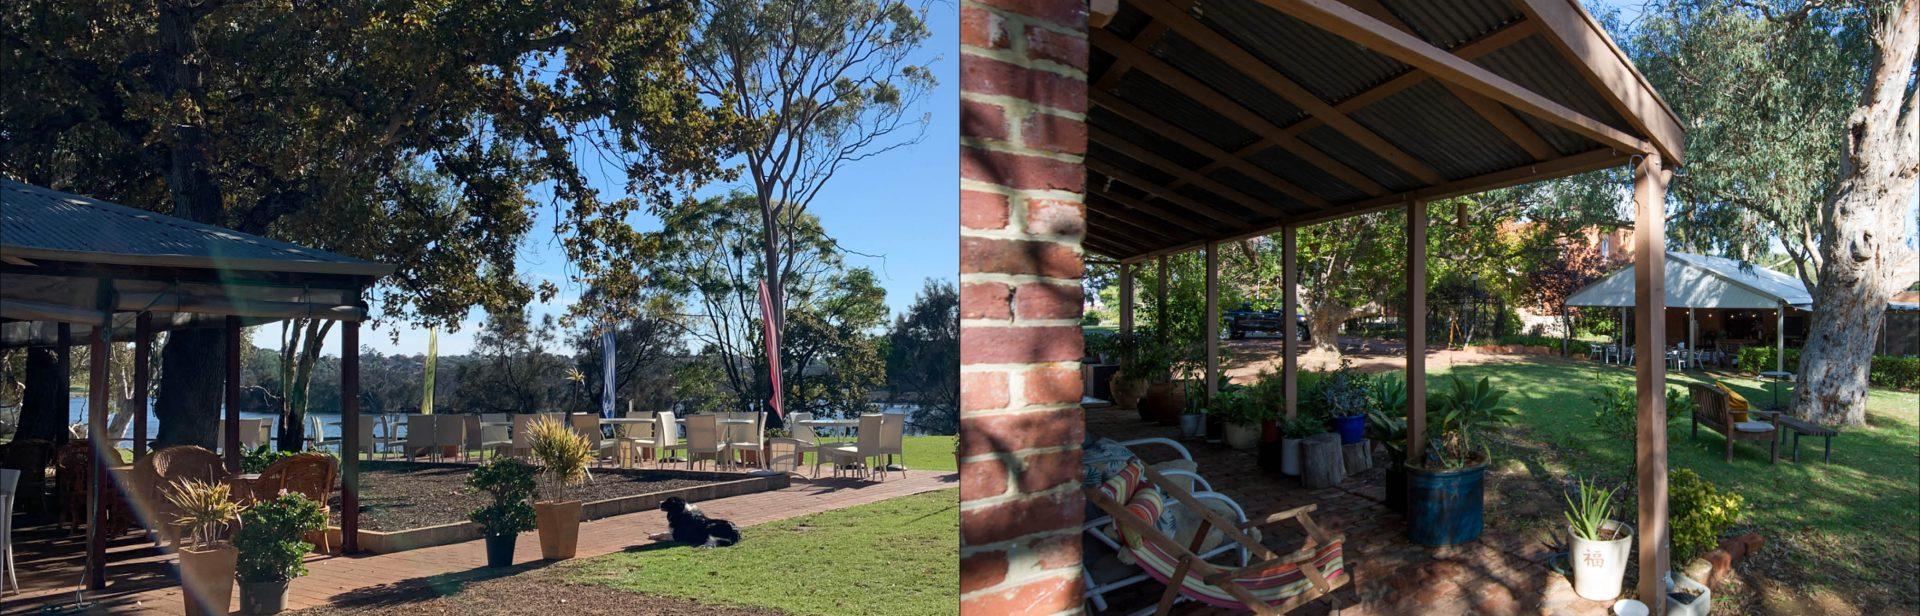 Woodbridge and Peninsula Farm Cafes